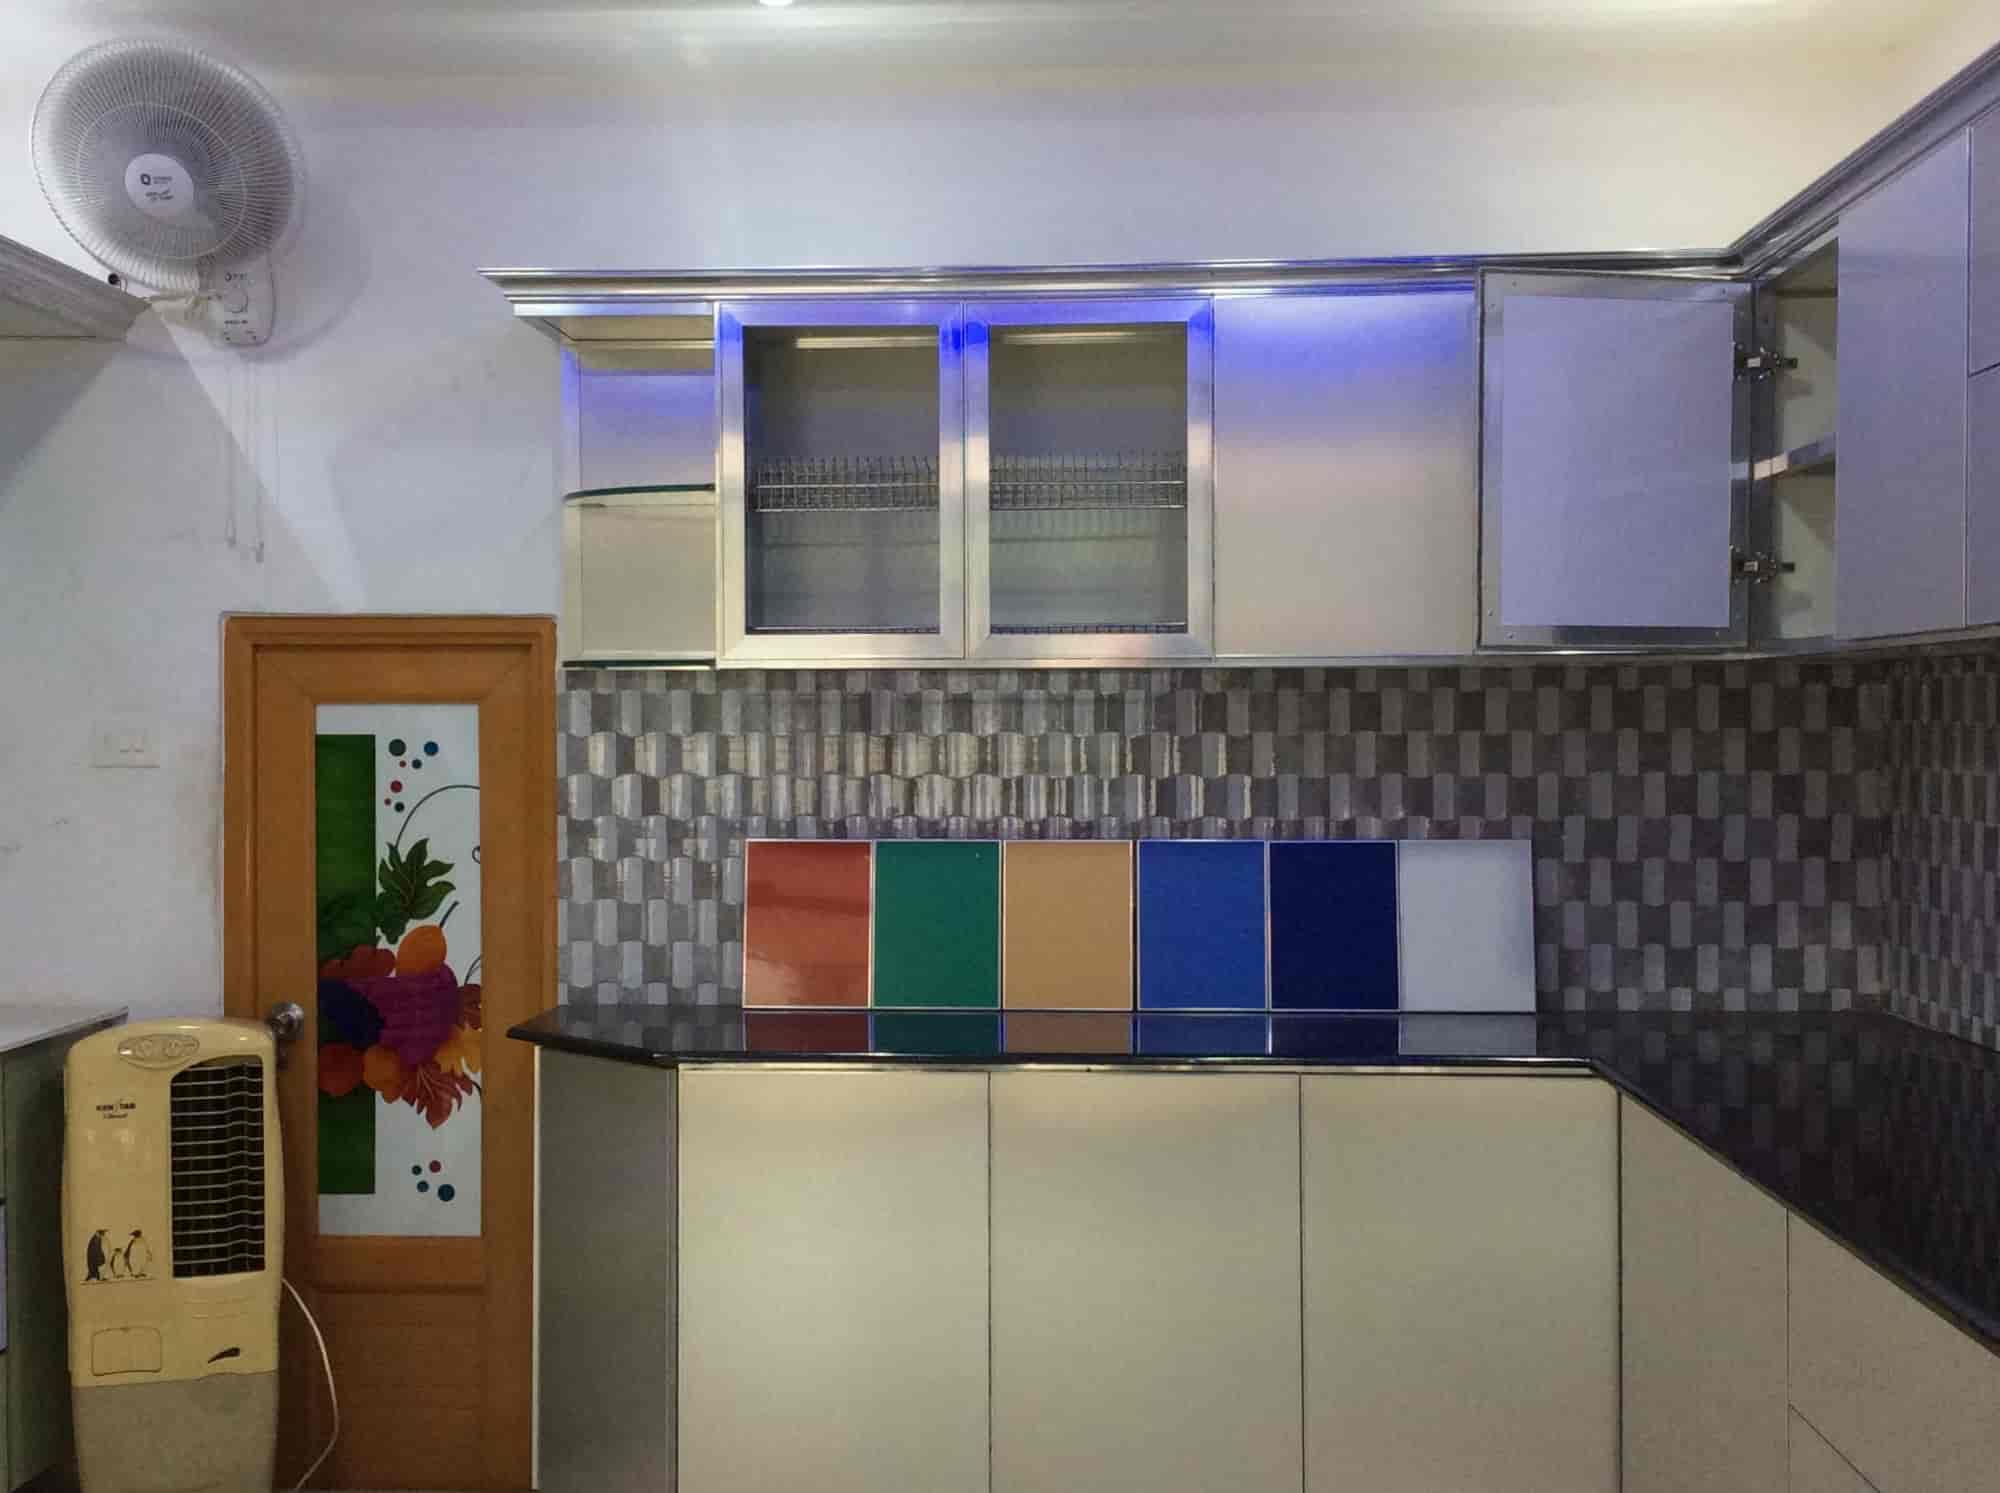 Indoor World Class Kitchens